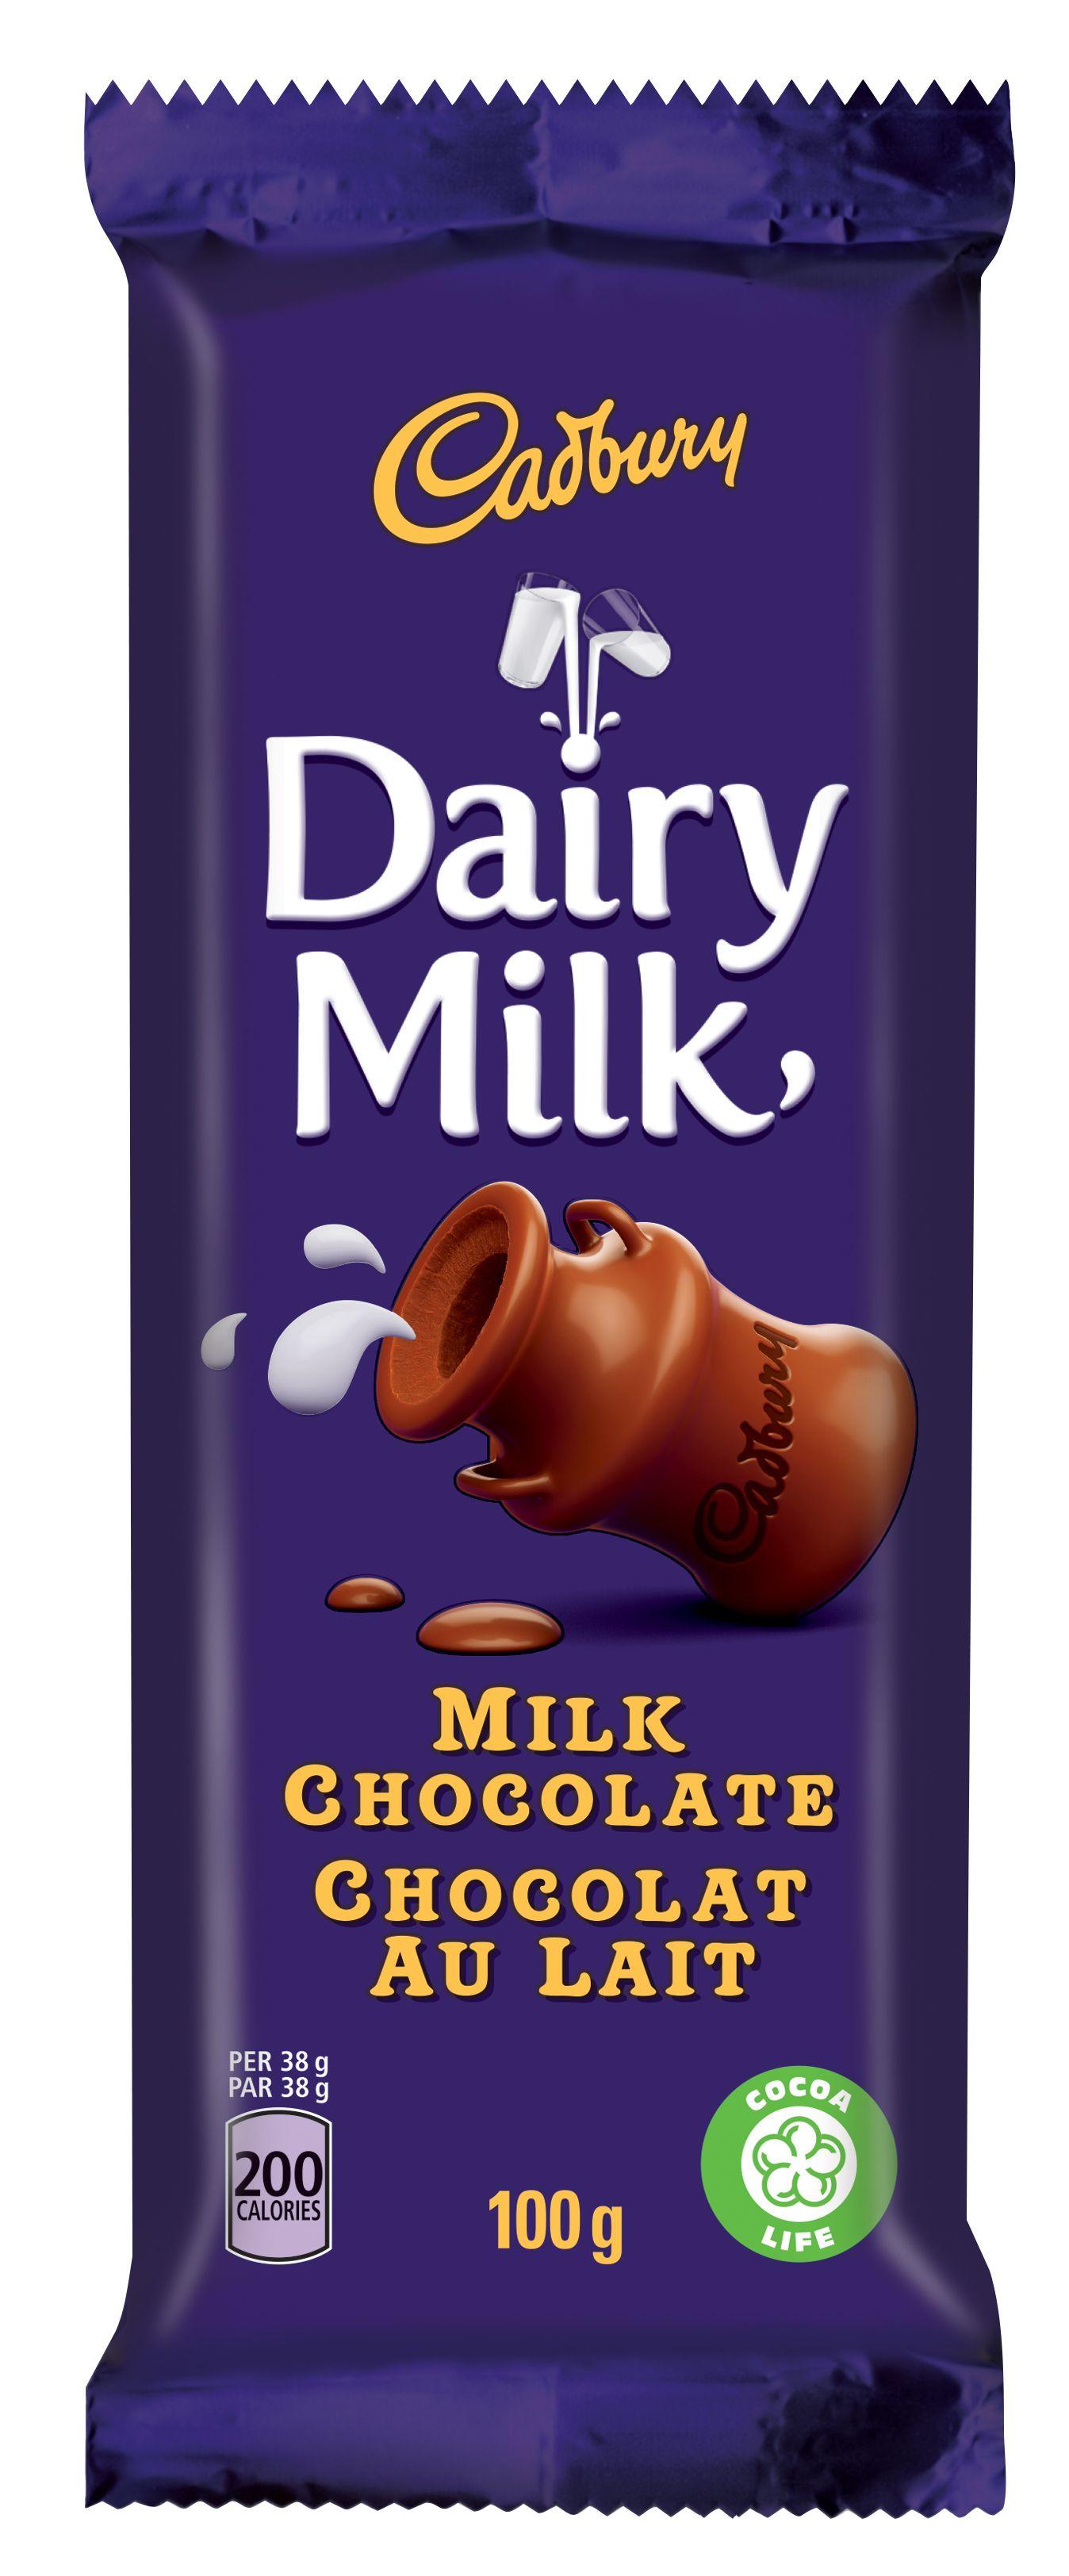 Cadbury Dairy Milk Milk Chocolate Chocolate Bar 100 G